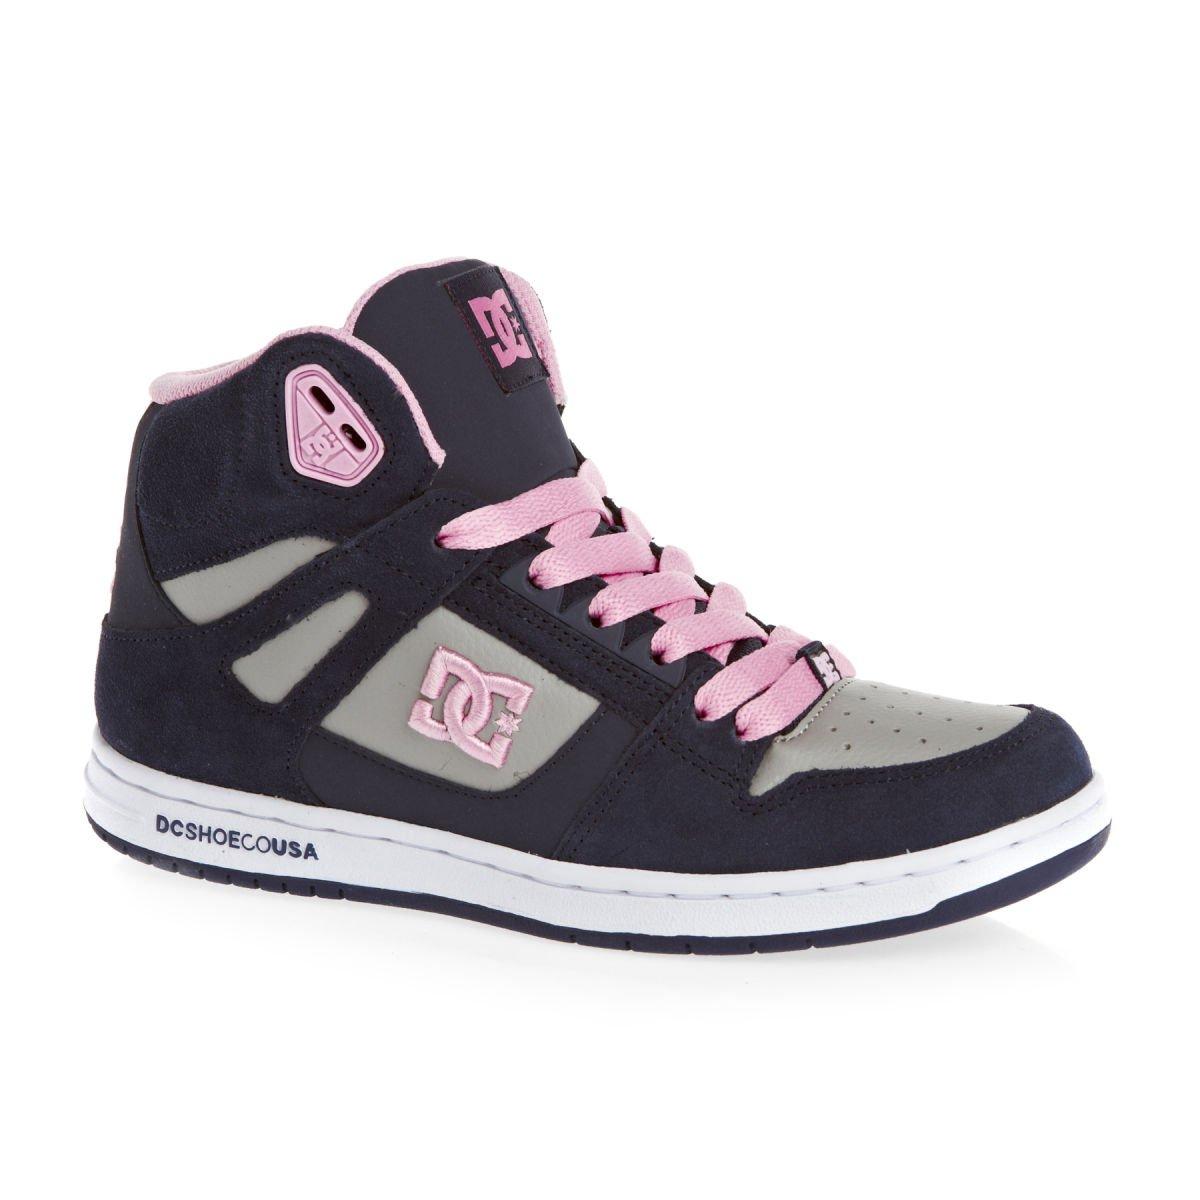 DC Youth Rebound Skate Shoes B00BW1ARNG 7.5 M US|Navy